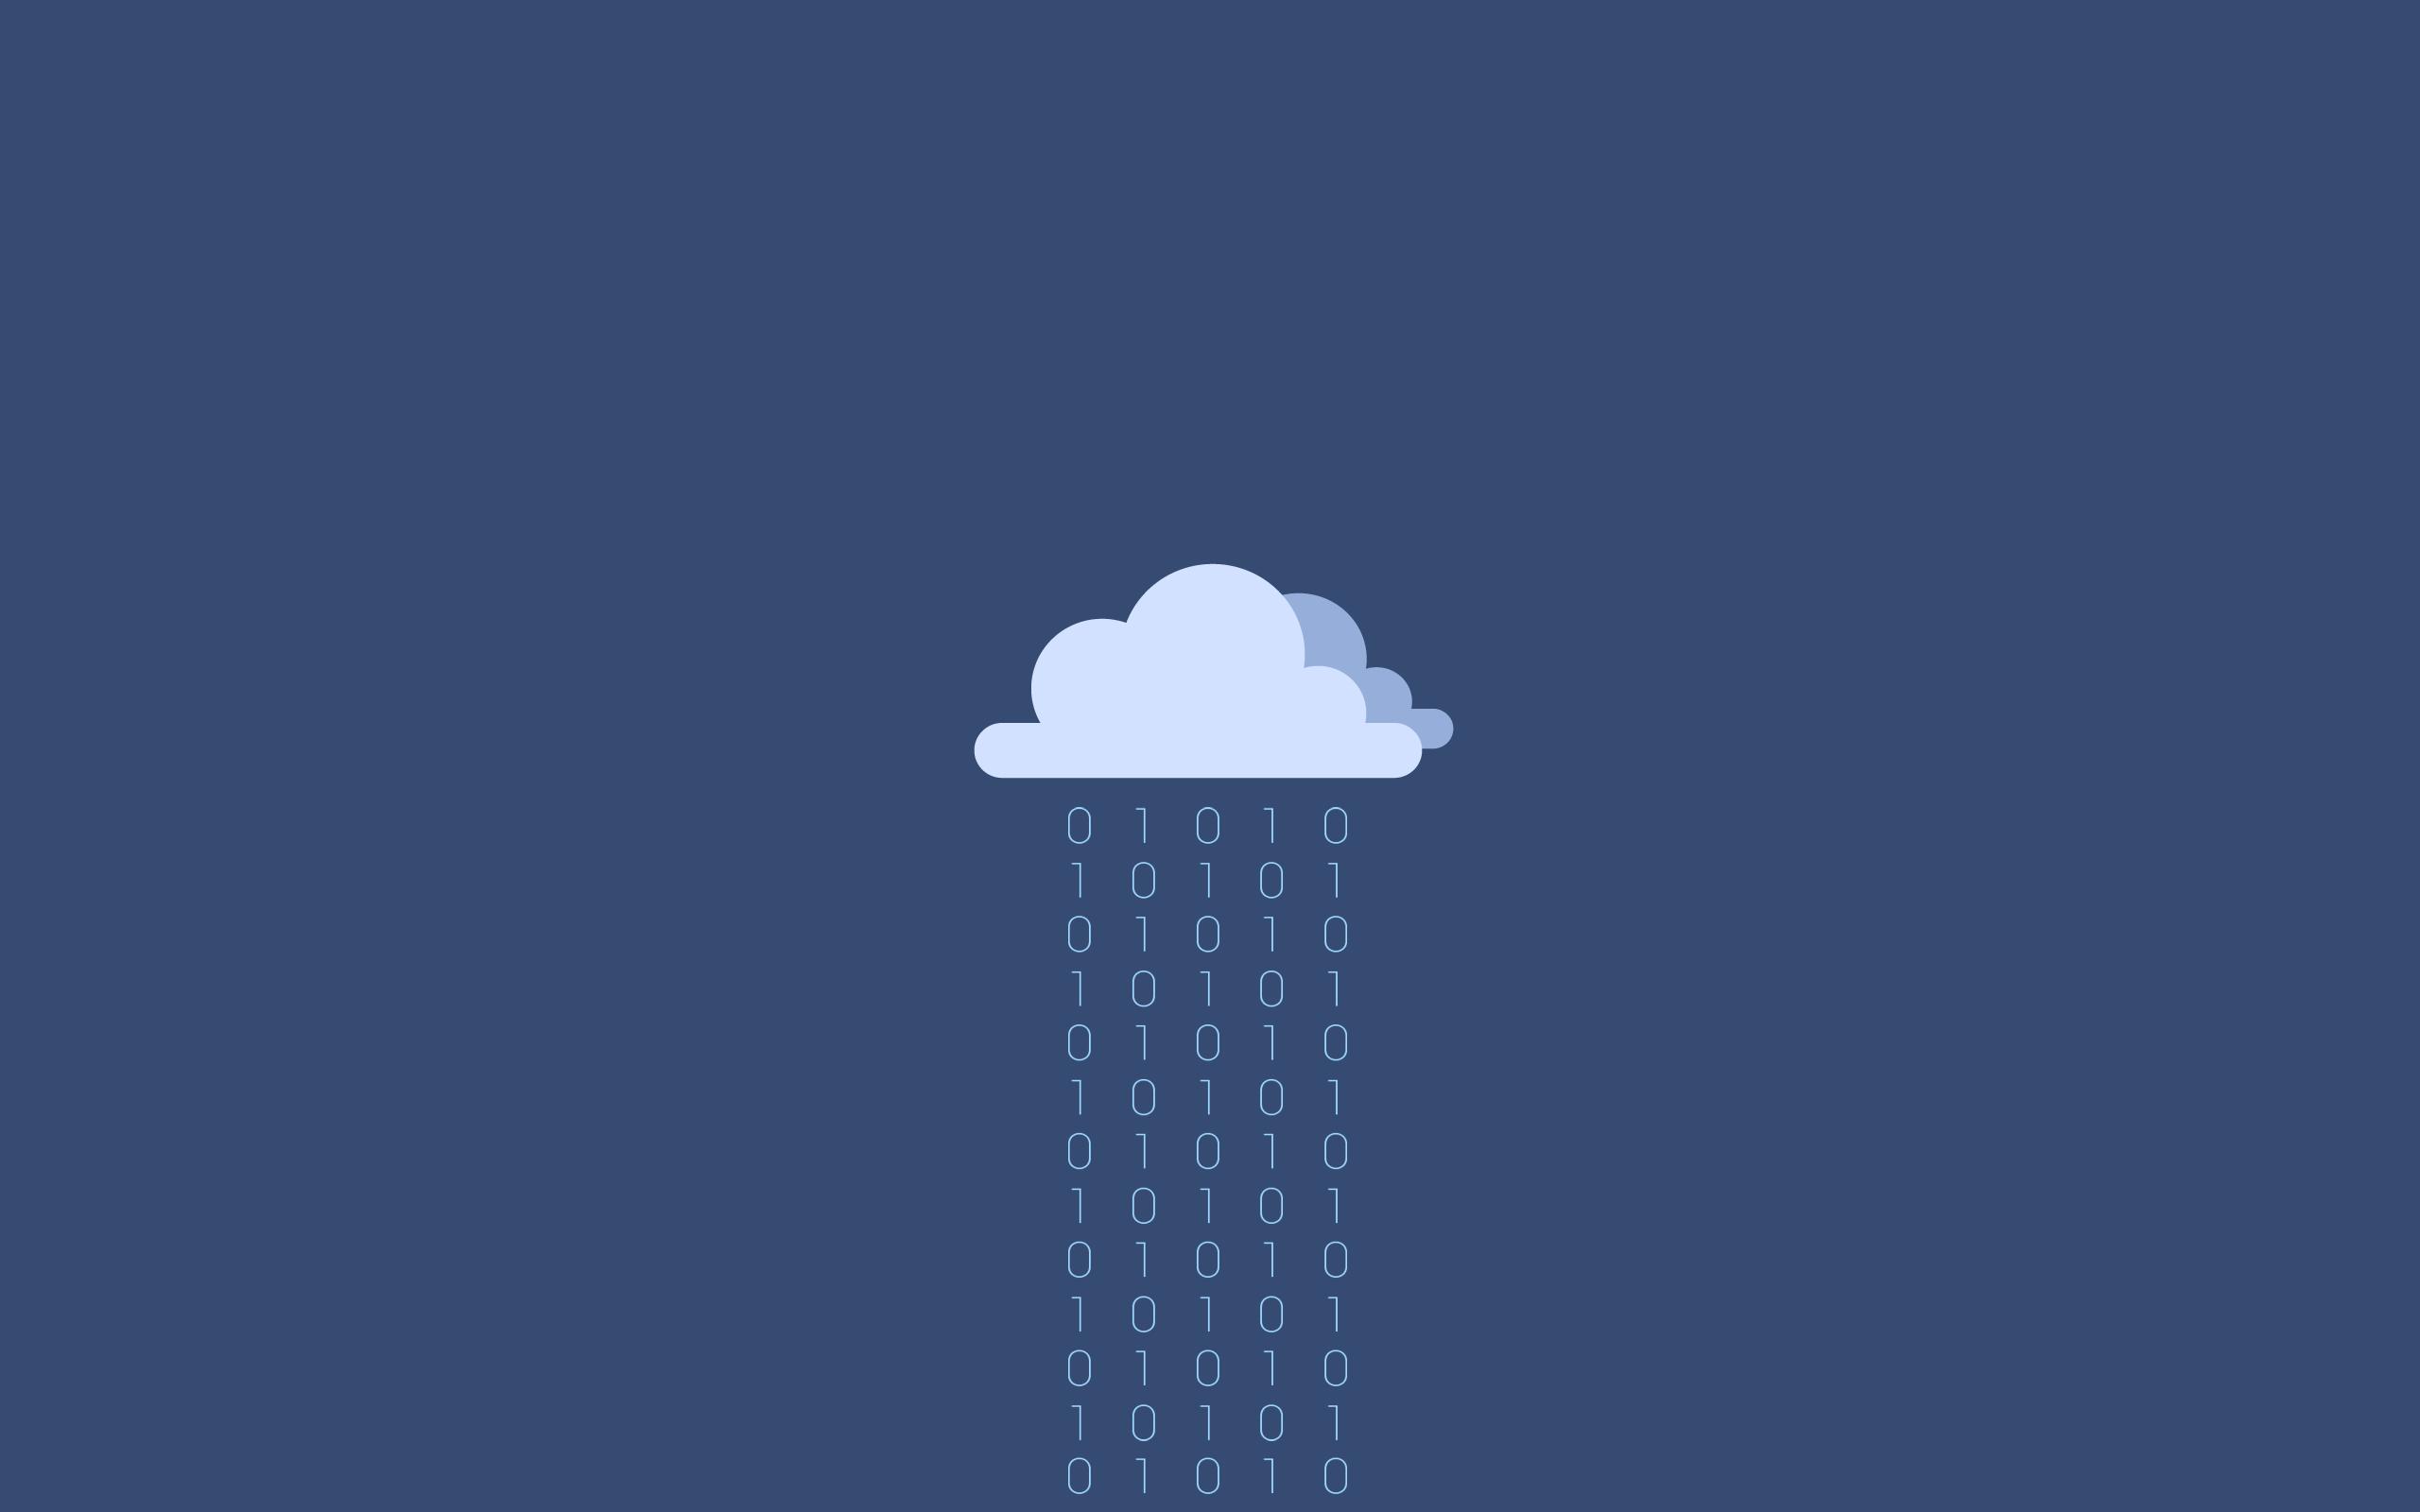 wallpapers/cloud.png